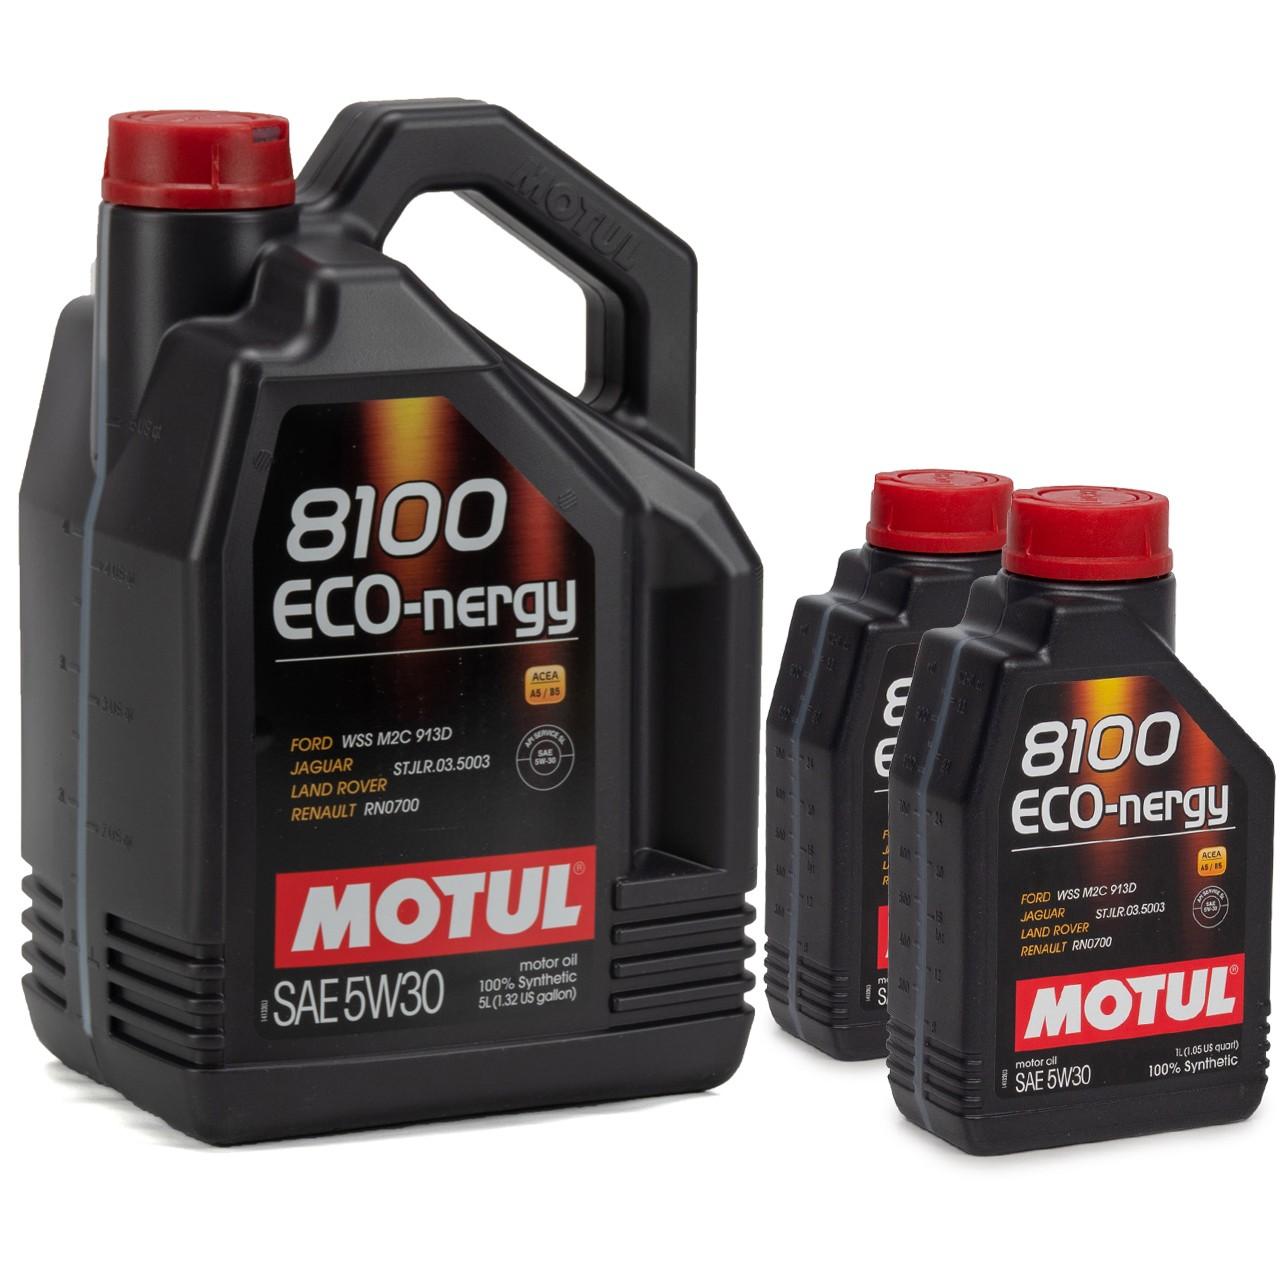 MOTUL 8100 ECO-nergy Motoröl Öl 5W30 FORD WSS M2C 913D RENAULT RN0700 - 7 Liter